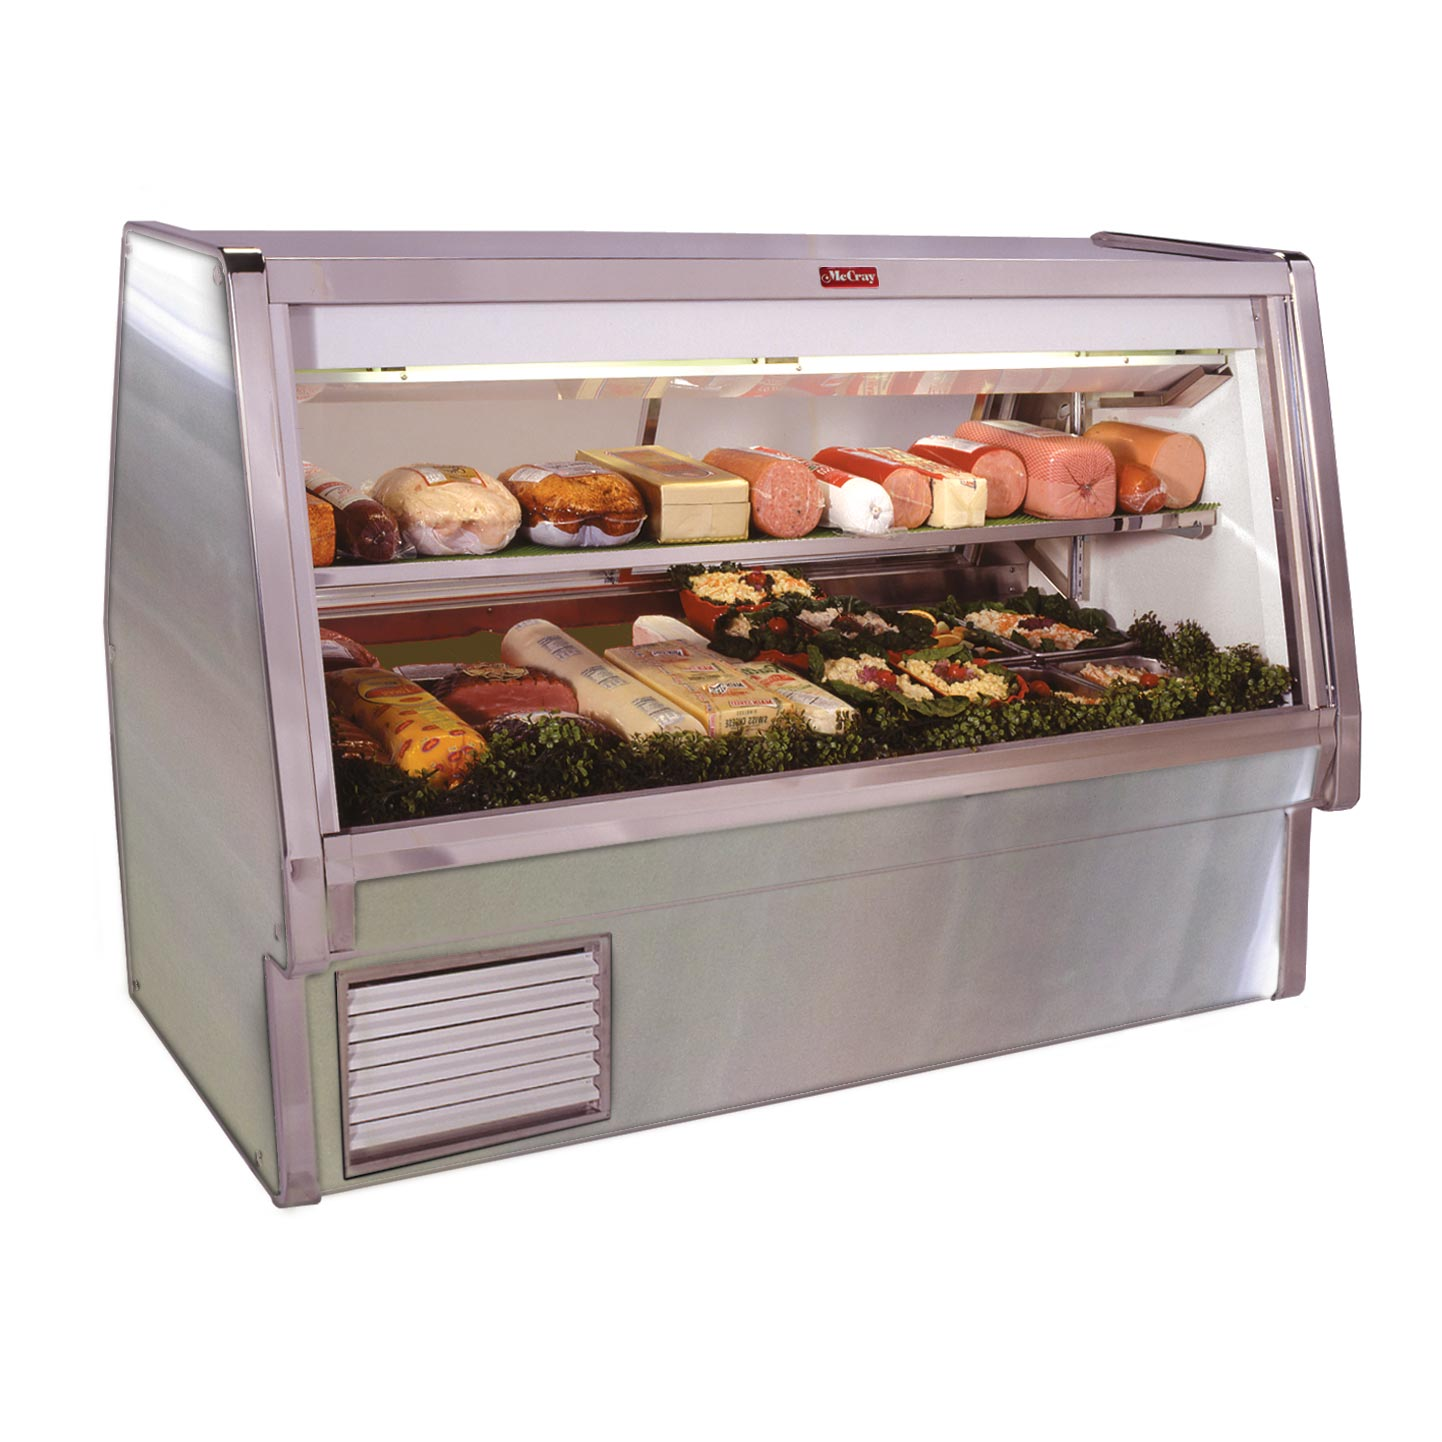 Howard-McCray SC-CDS34E-10-S-LED display case, refrigerated deli